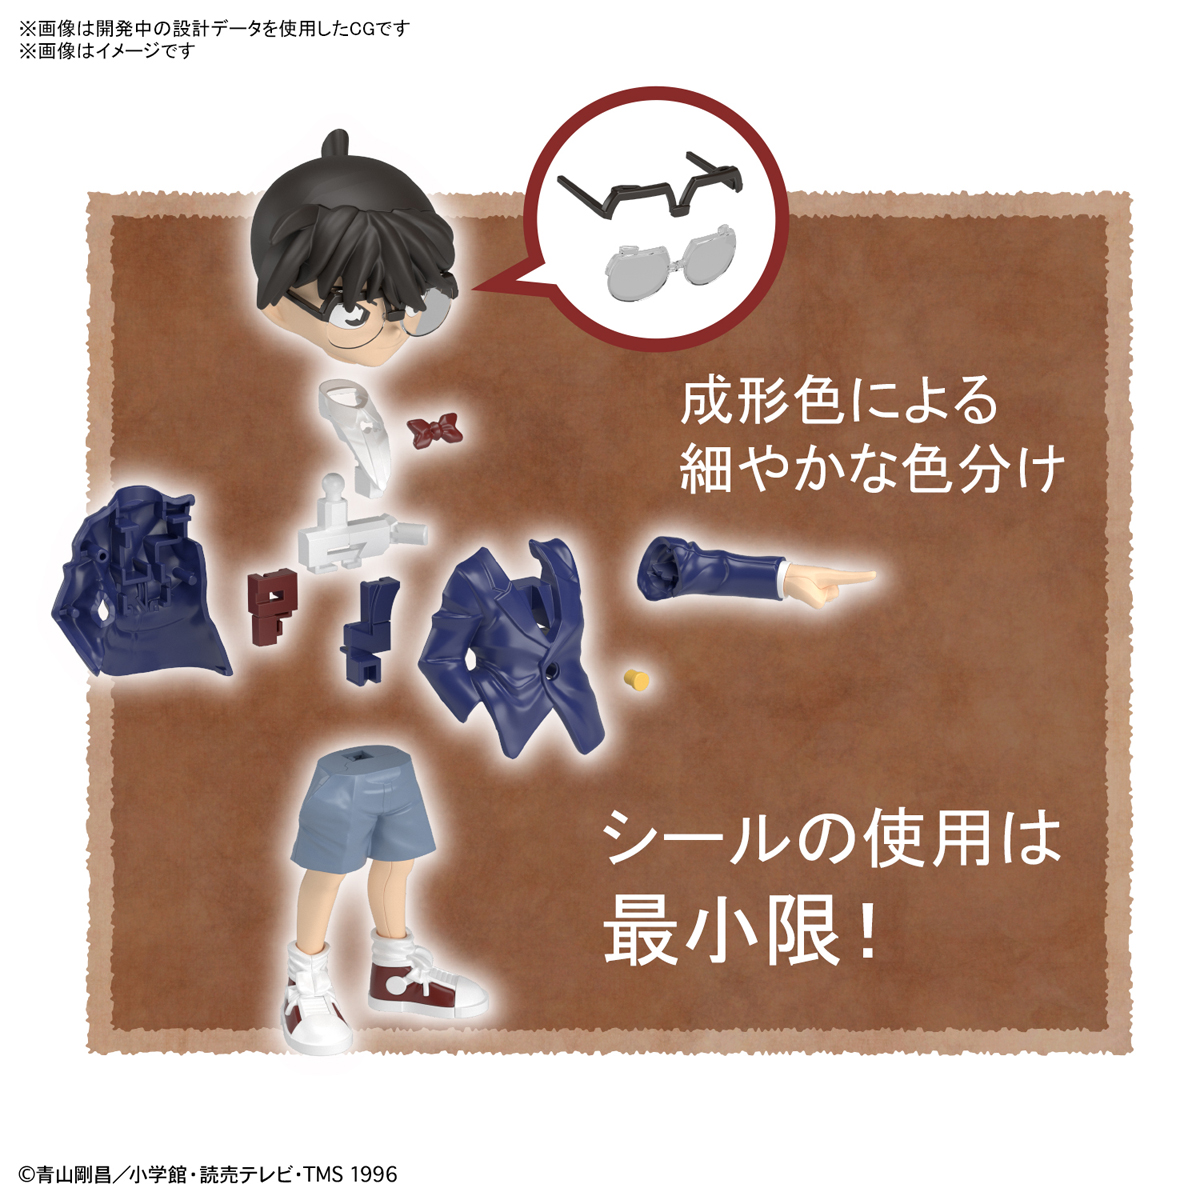 ENTRY GRADE『江戸川コナン』名探偵コナン プラモデル-004